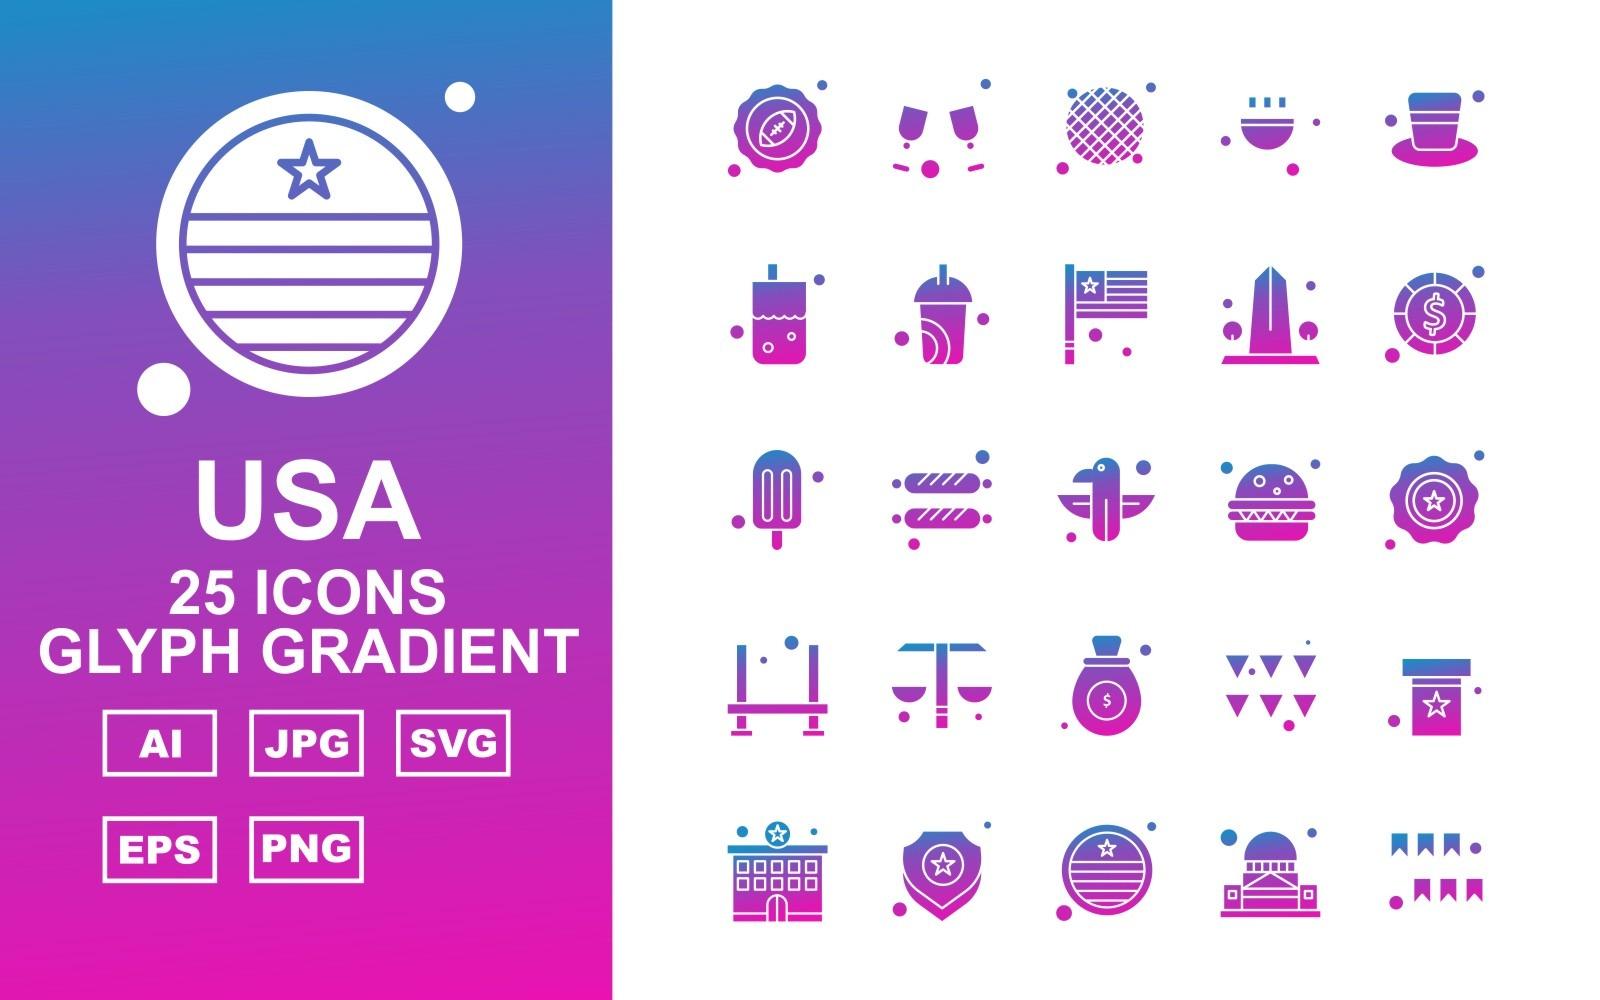 25 Premium USA Glyph Gradient Icon Pack Icon Sets 164744